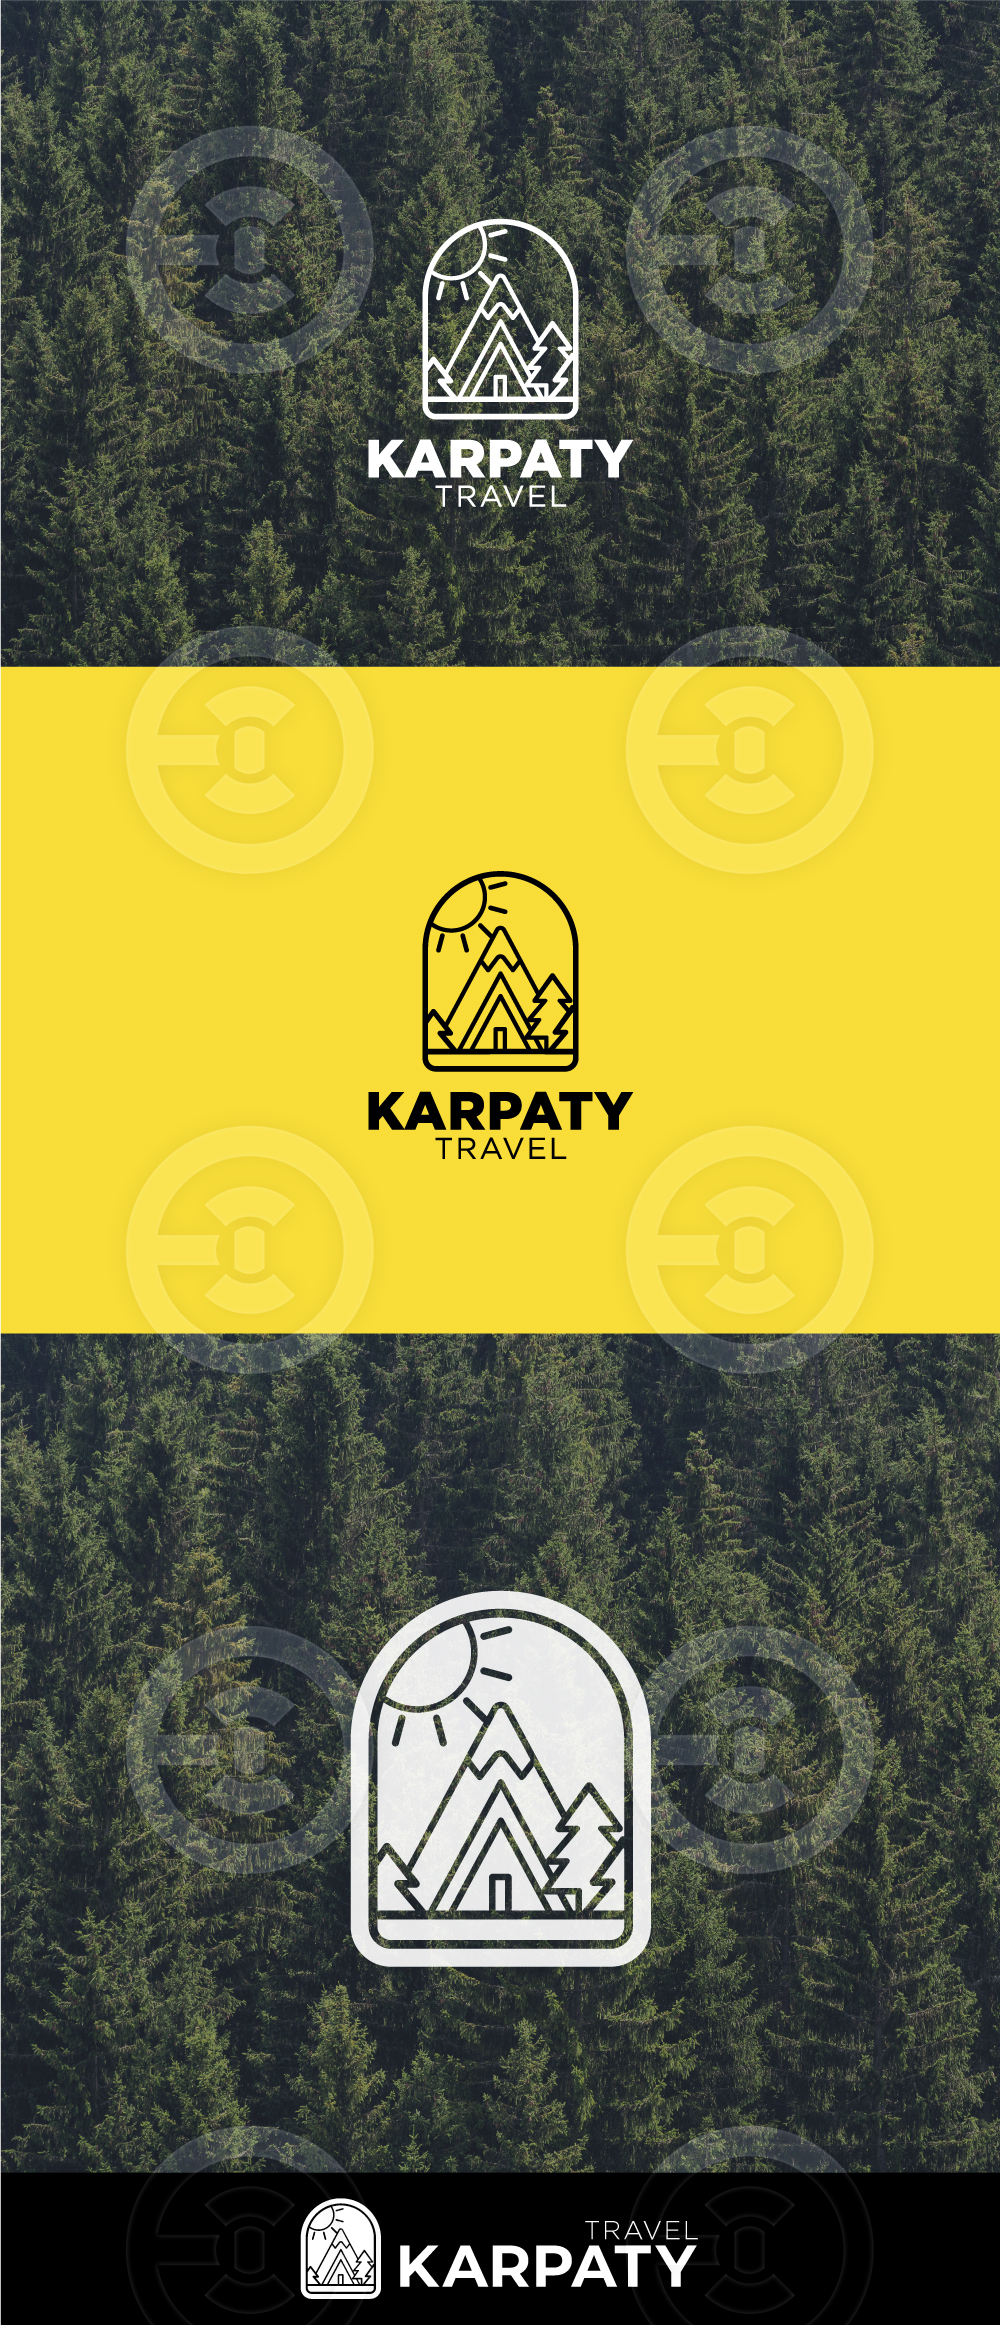 Karpaty_Travel_Logo.jpg